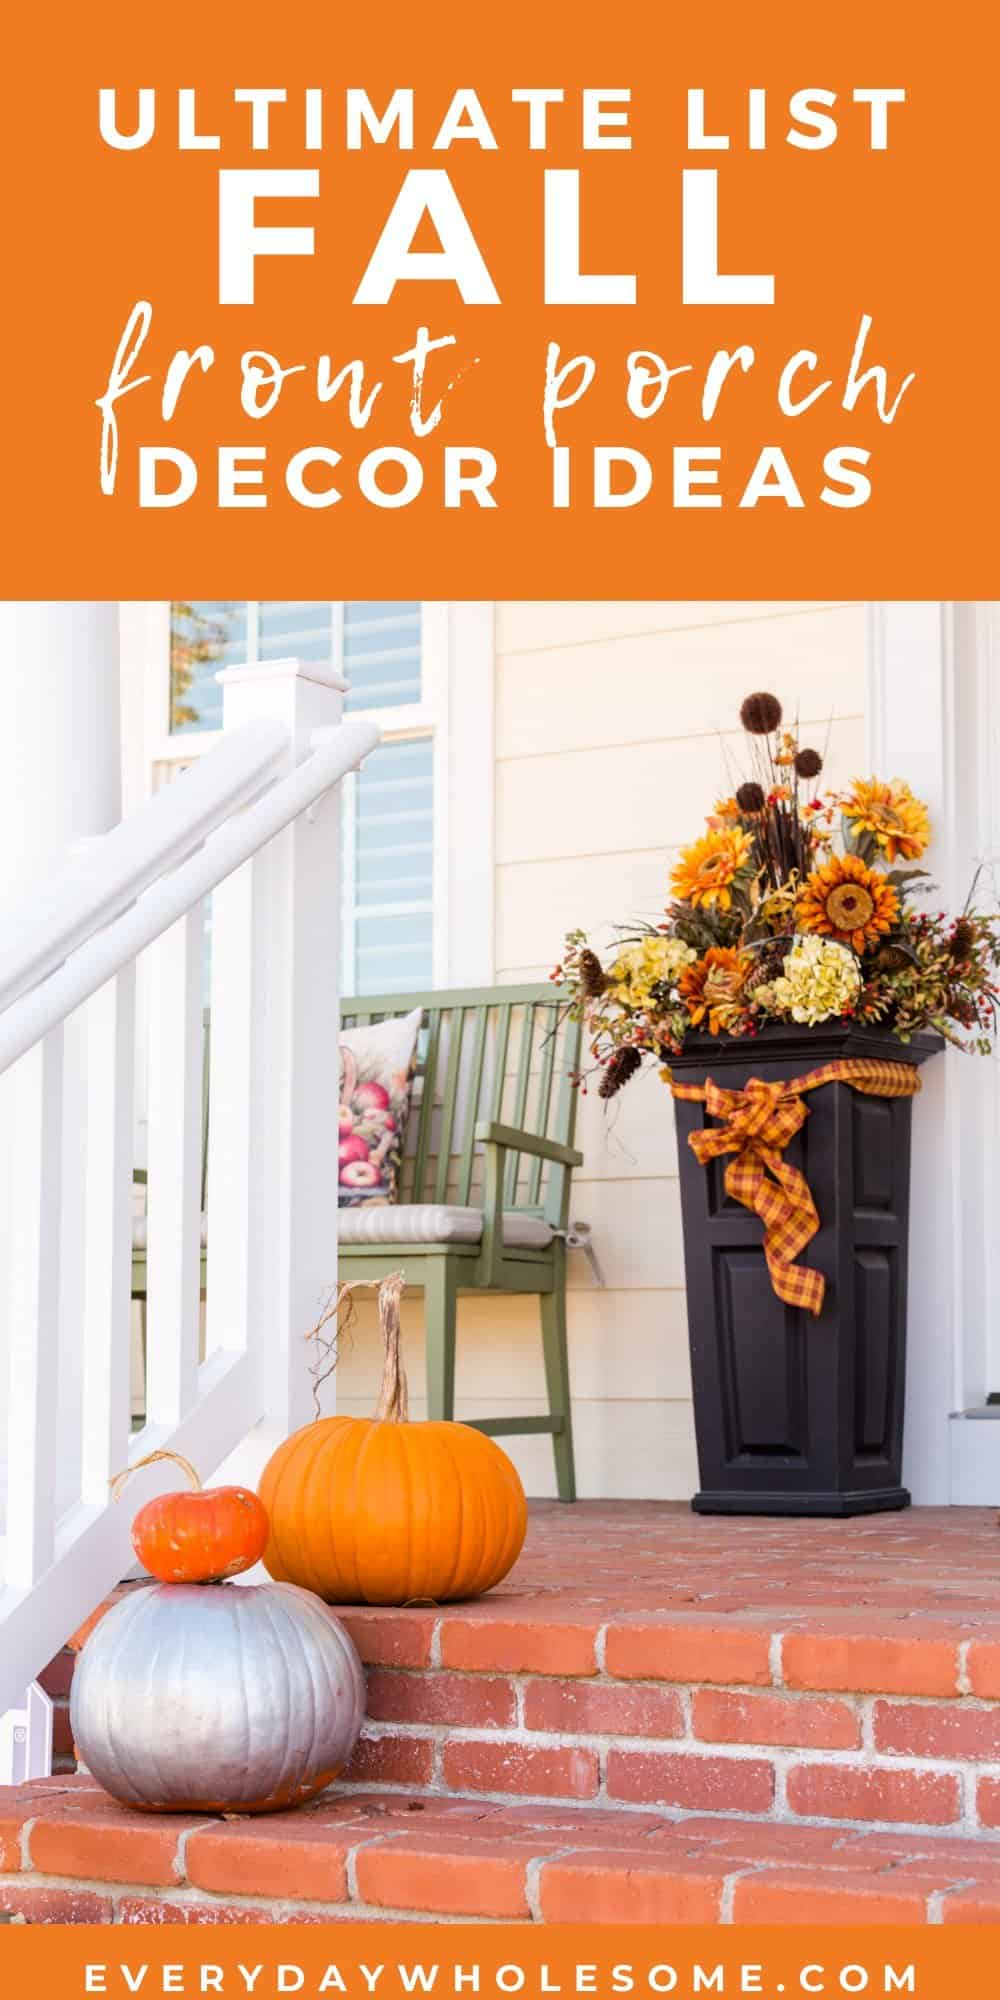 ultimate list fall front porch decor ideas